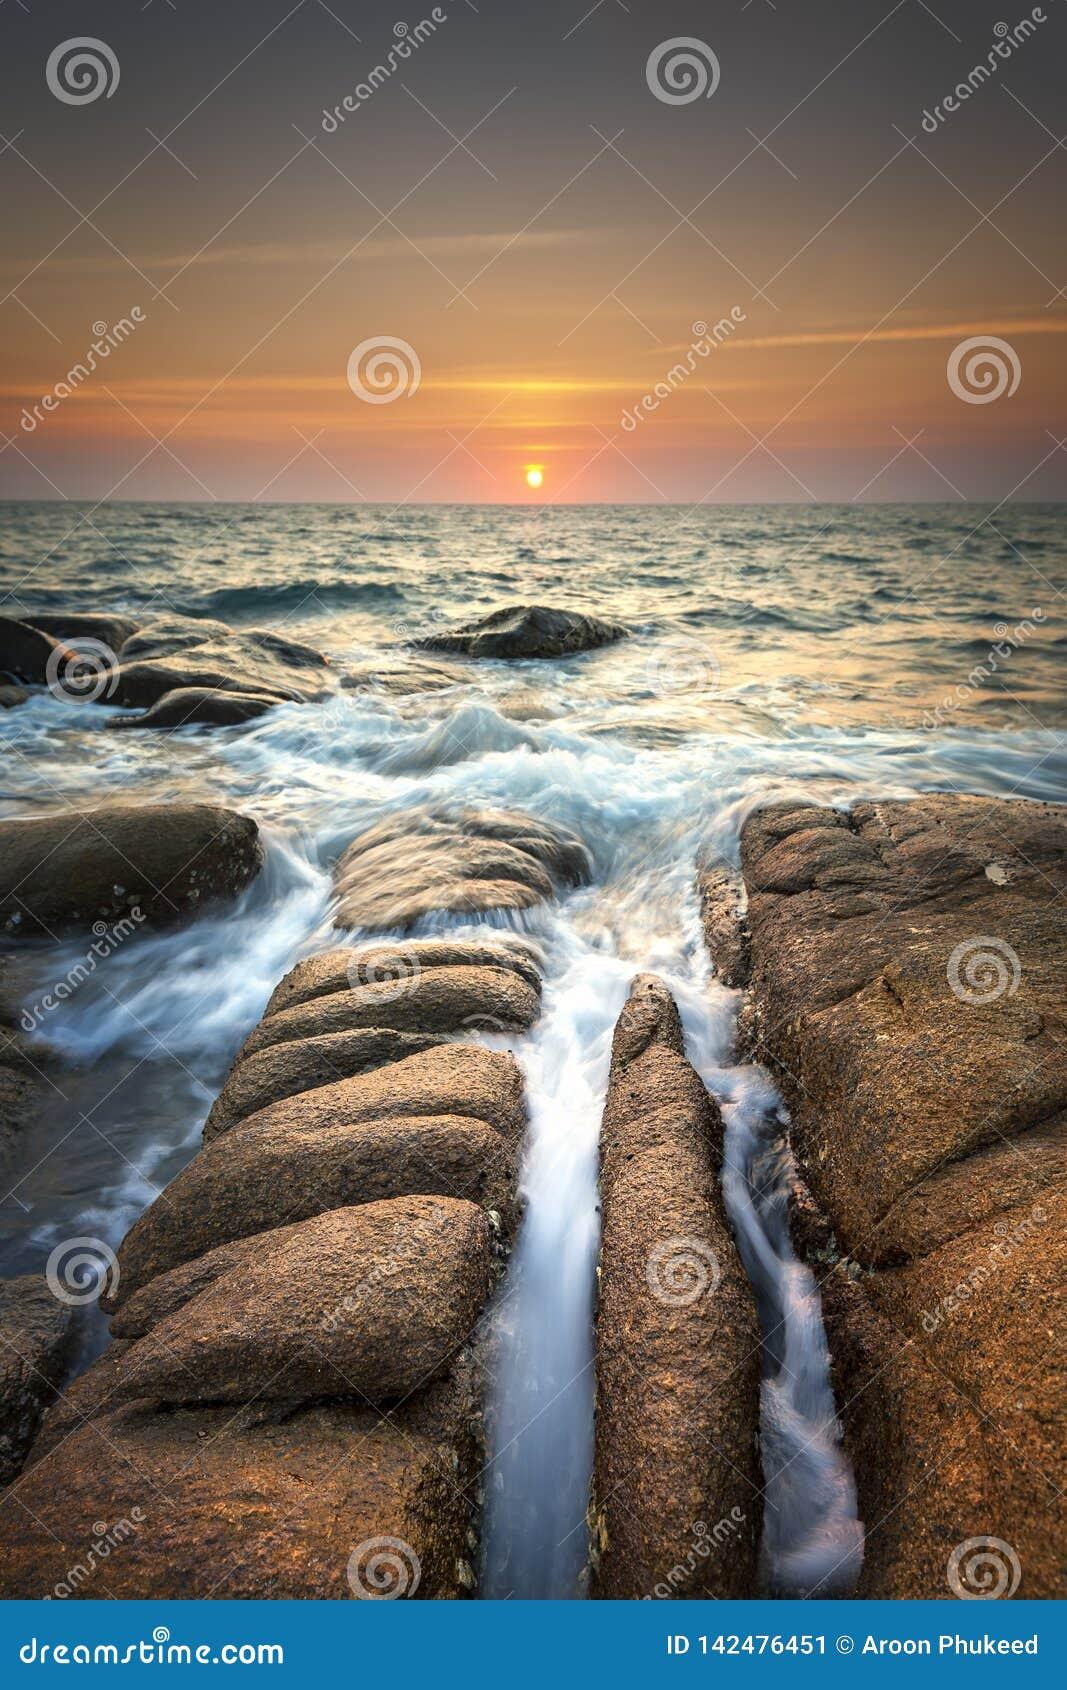 Meerblick während des Sonnenuntergangs Schöner natürlicher Sommermeerblick während des Sonnenuntergangs